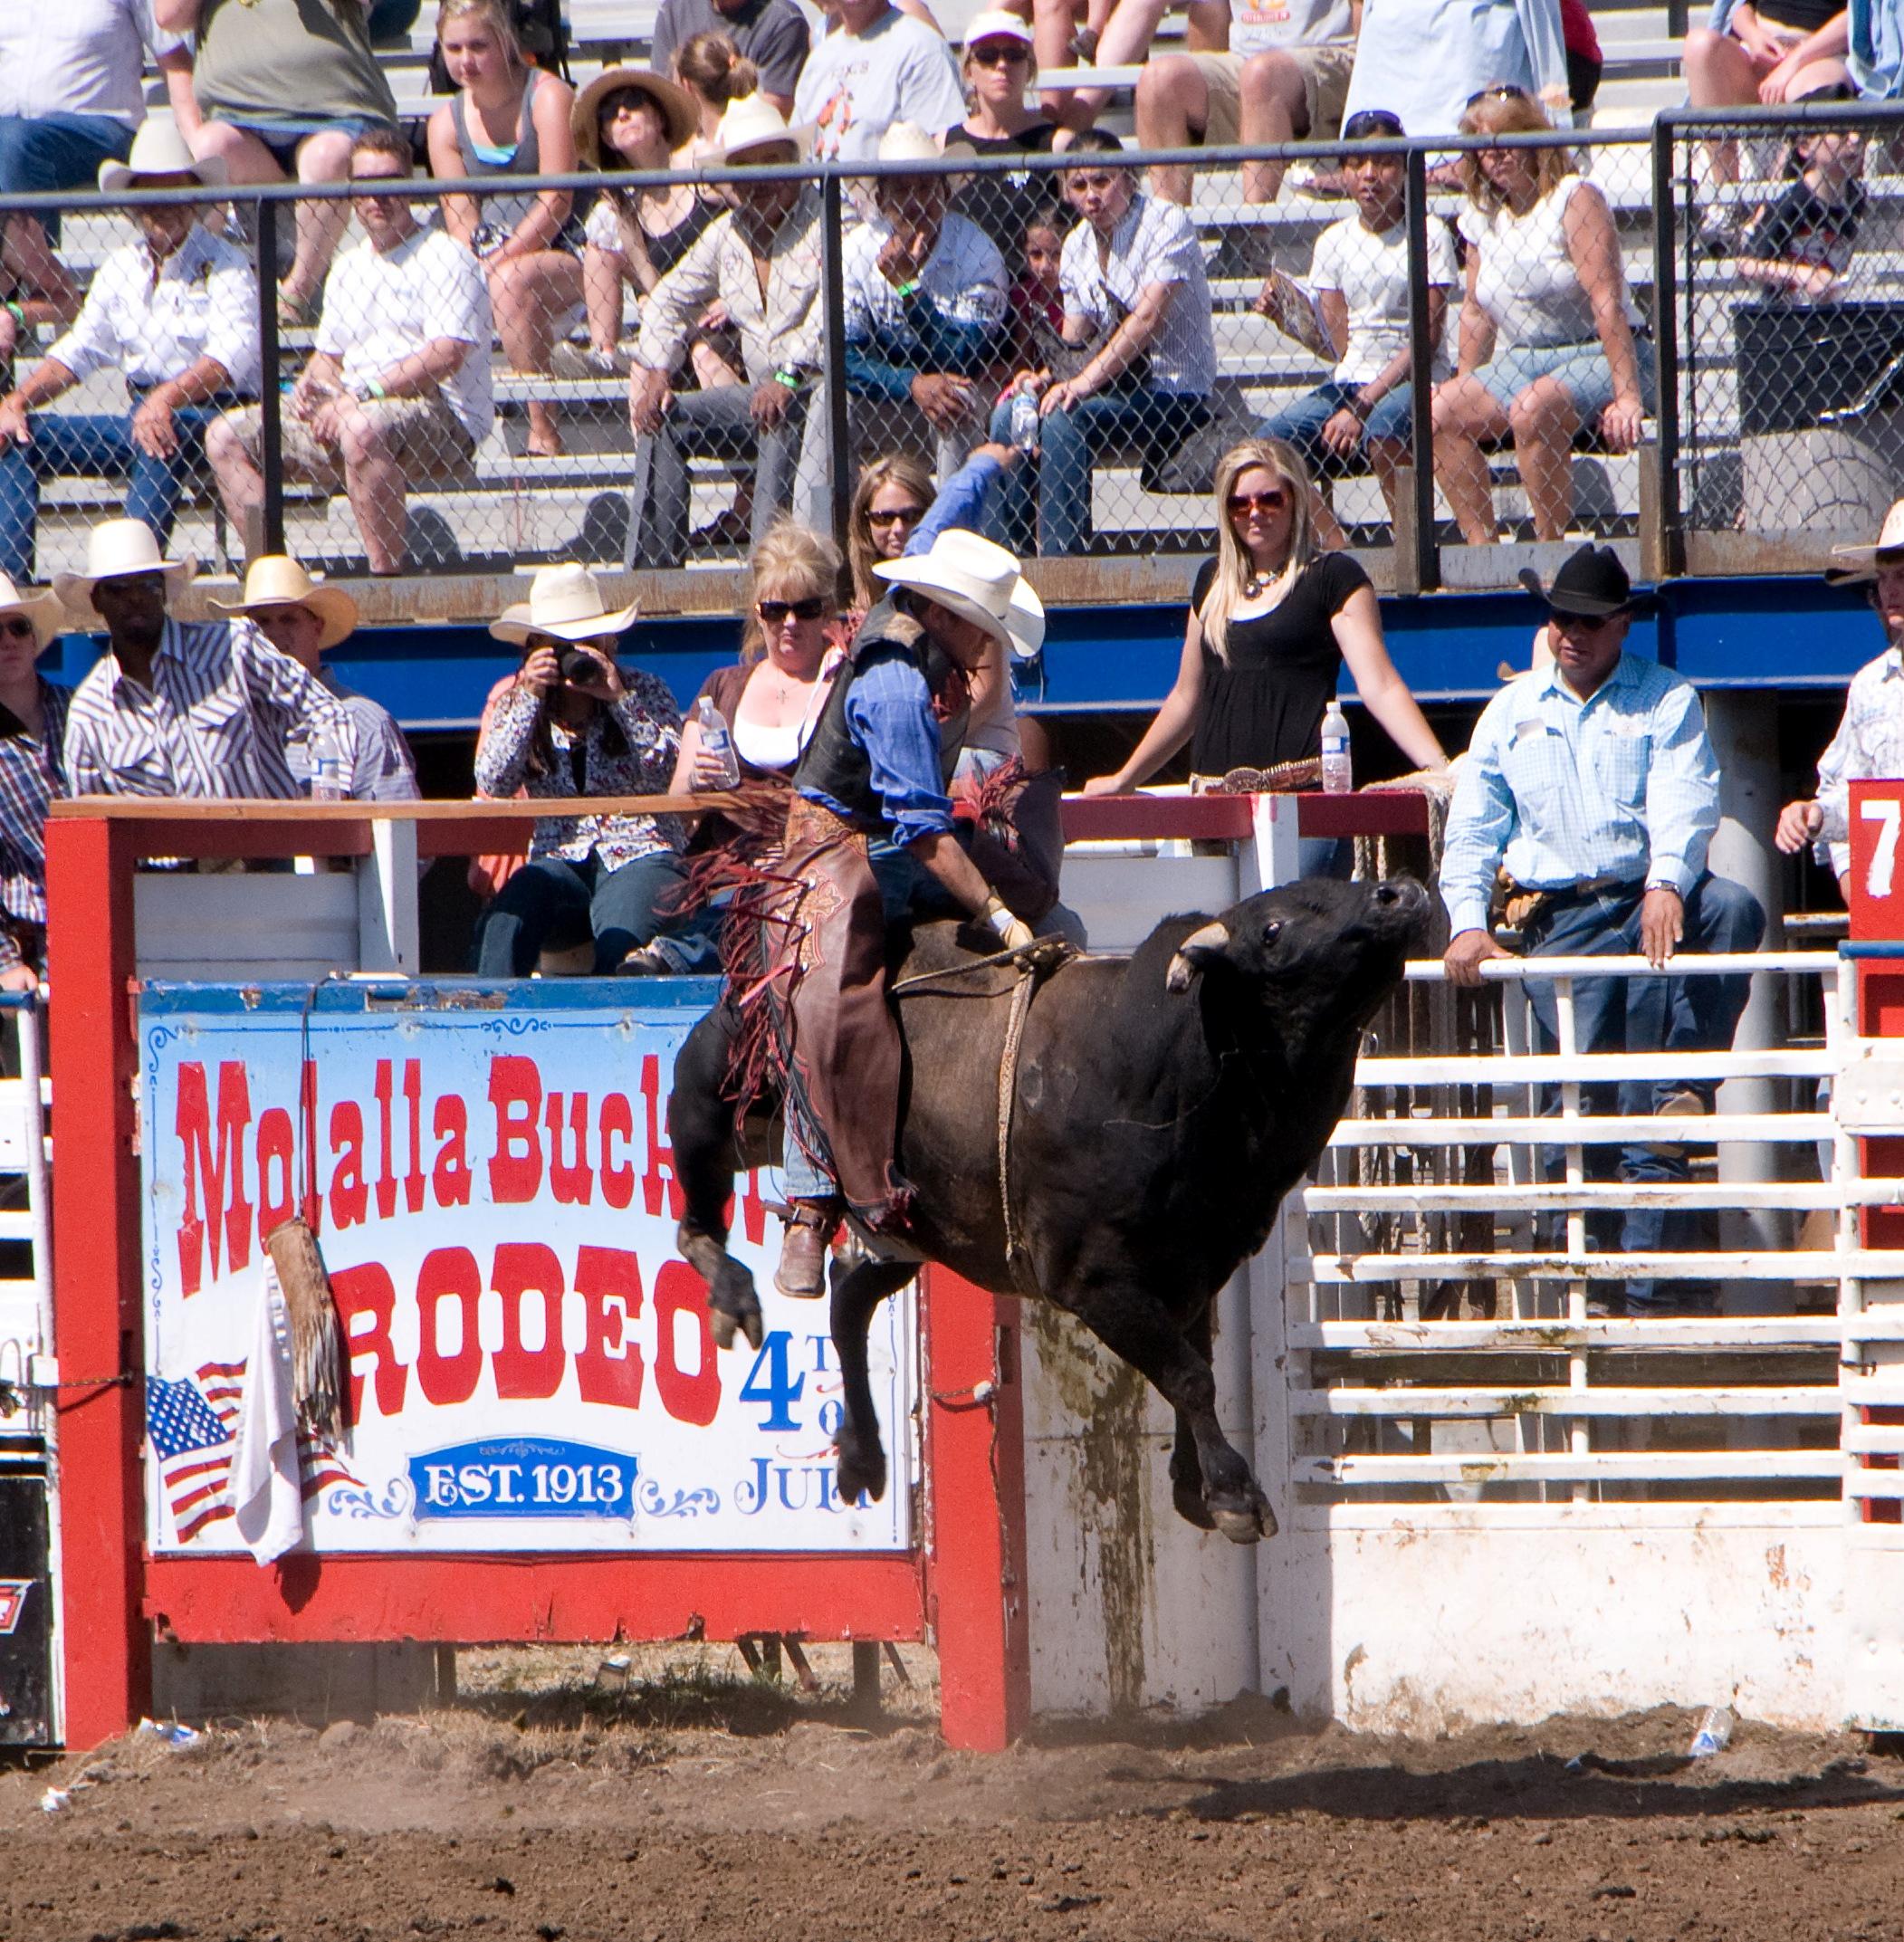 Molalla Buckeroo Bull Riding and Rodeo Sign